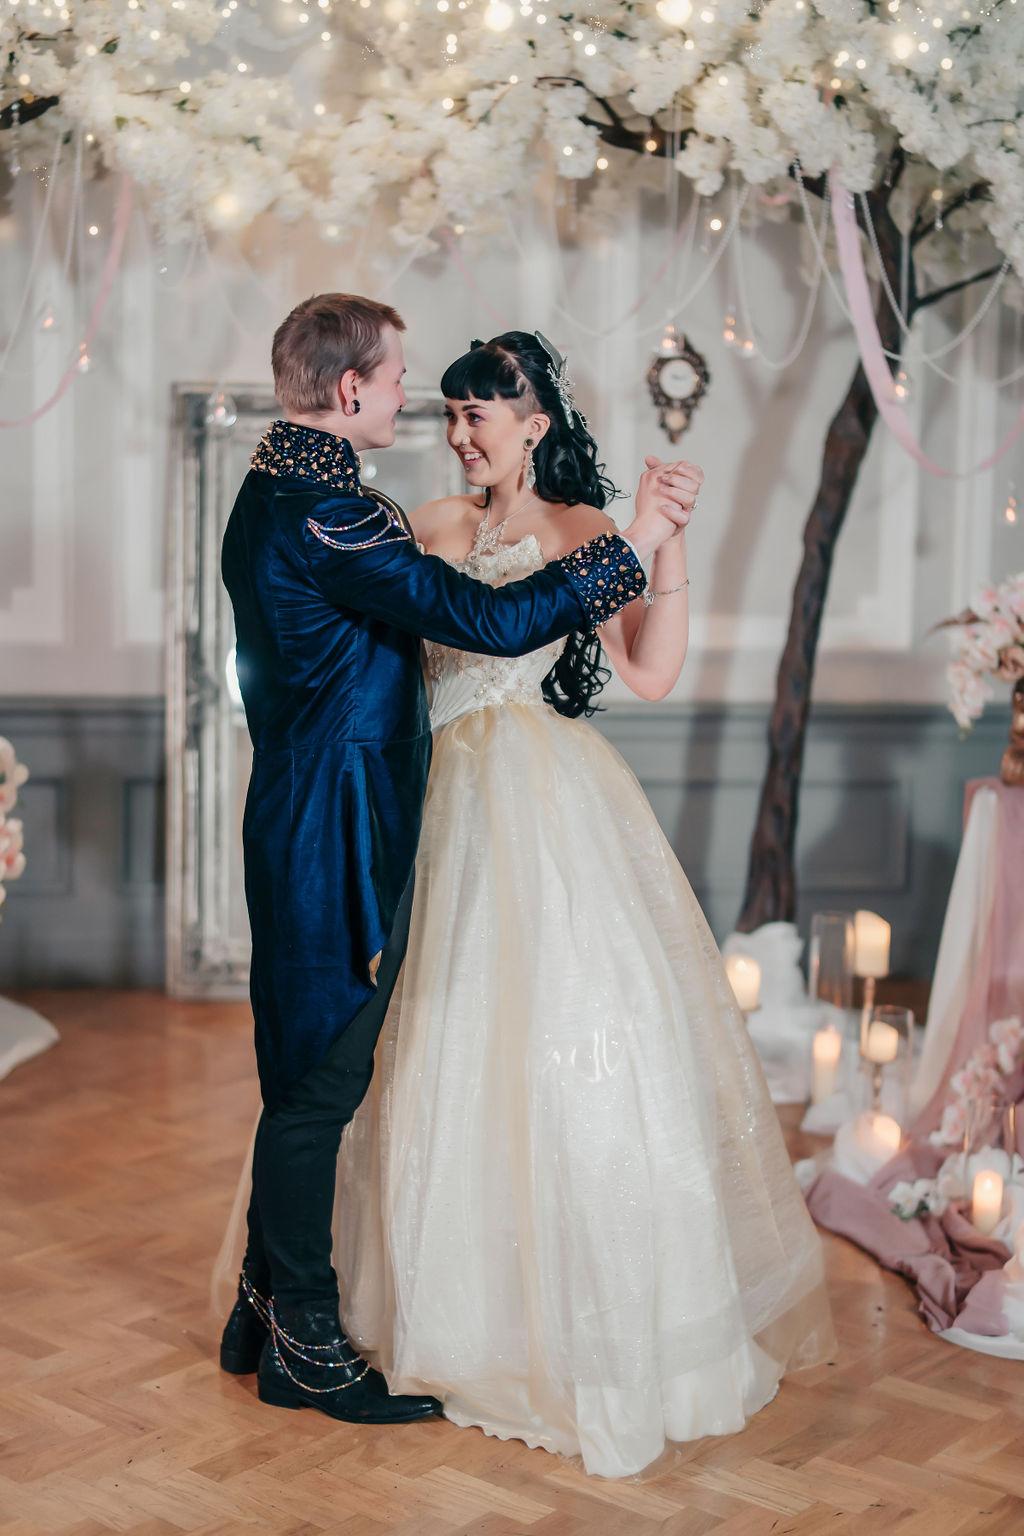 Couple dancing at their fairytale wedding day - labyrinth themed wedding by doodah photography